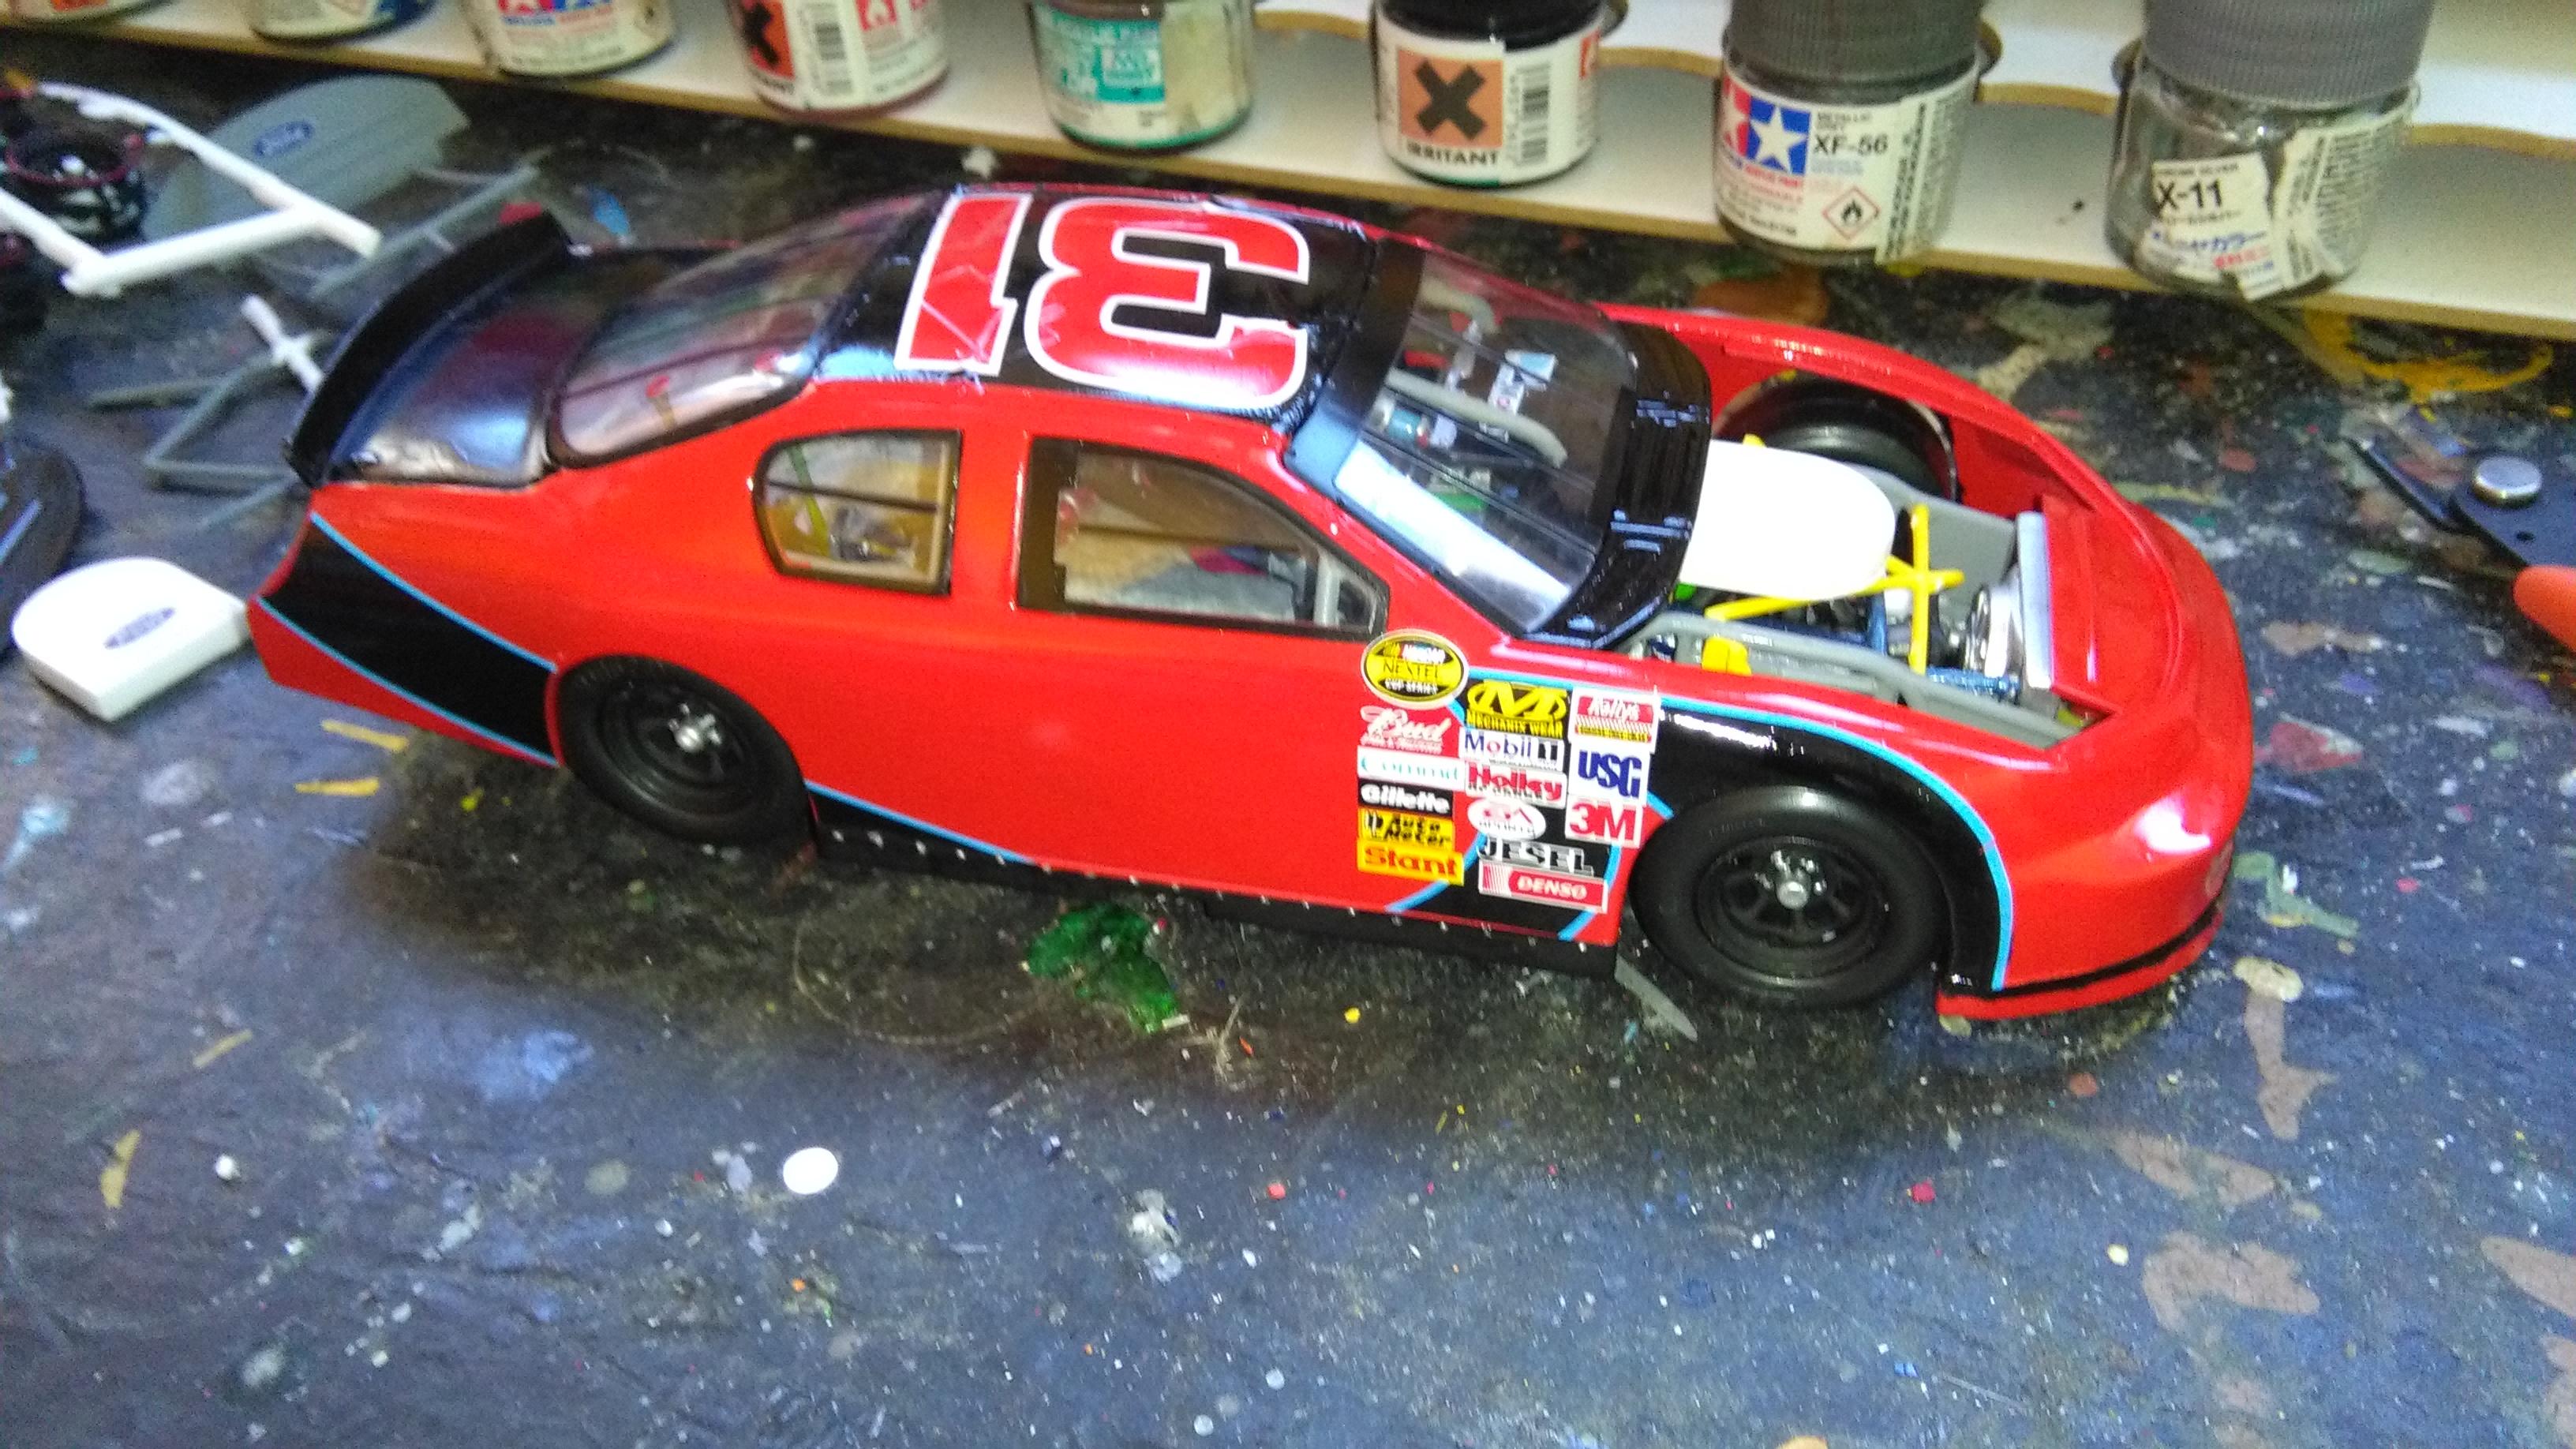 Chevy Impala 2006 #31 Jeff Burton Cingular 751272IMG20170418182838